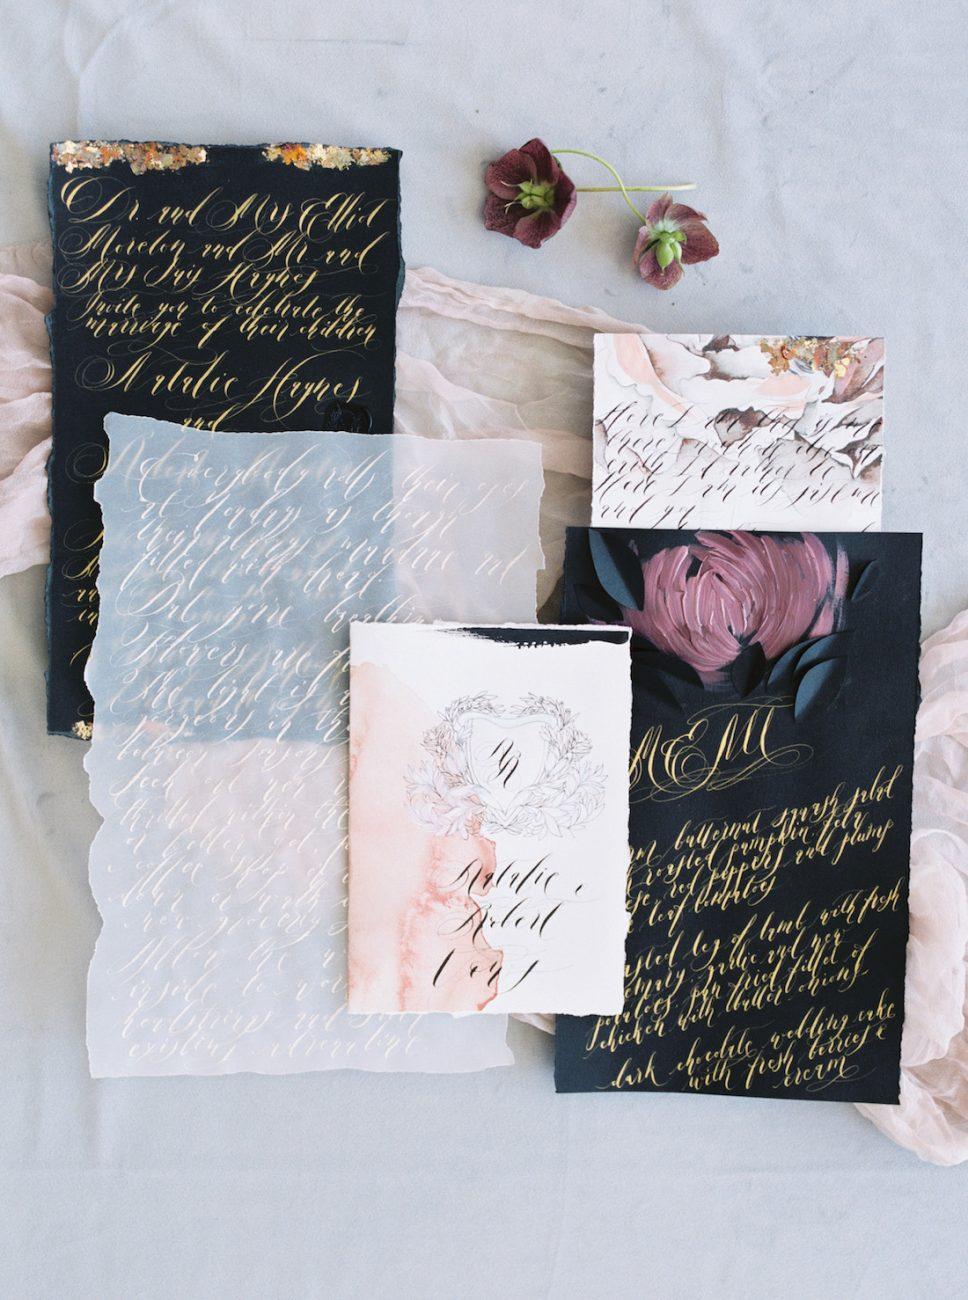 Moody Black Wedding Inspiration_black wedding invitations with gold foil